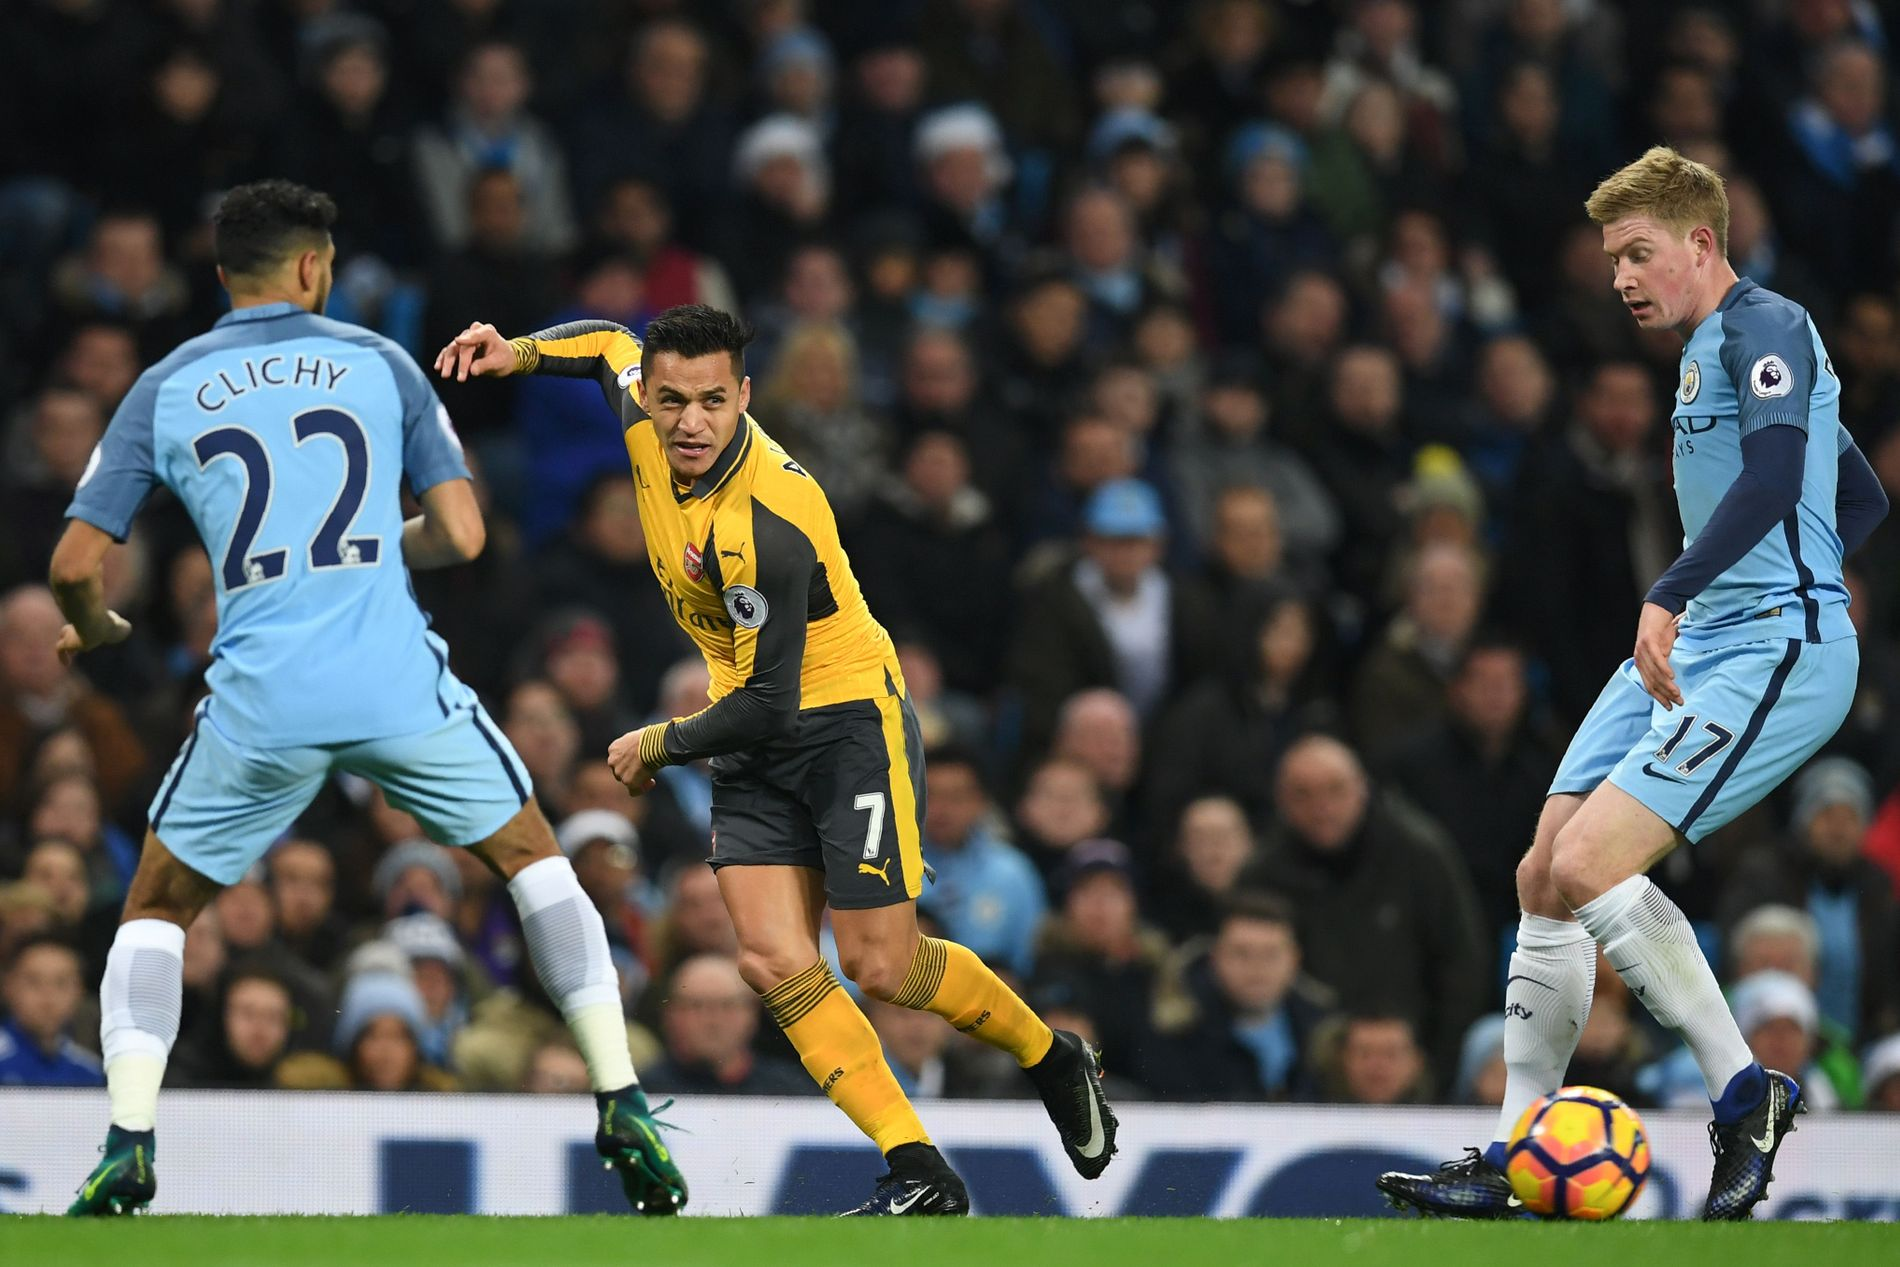 TJENER MEST: Alexis Sánchez er Premier Leagues best betalte spiller etter overgangen til Manchester United. Kevin De Bruyne (t.h.) meldte seg også på i toppen mandag.